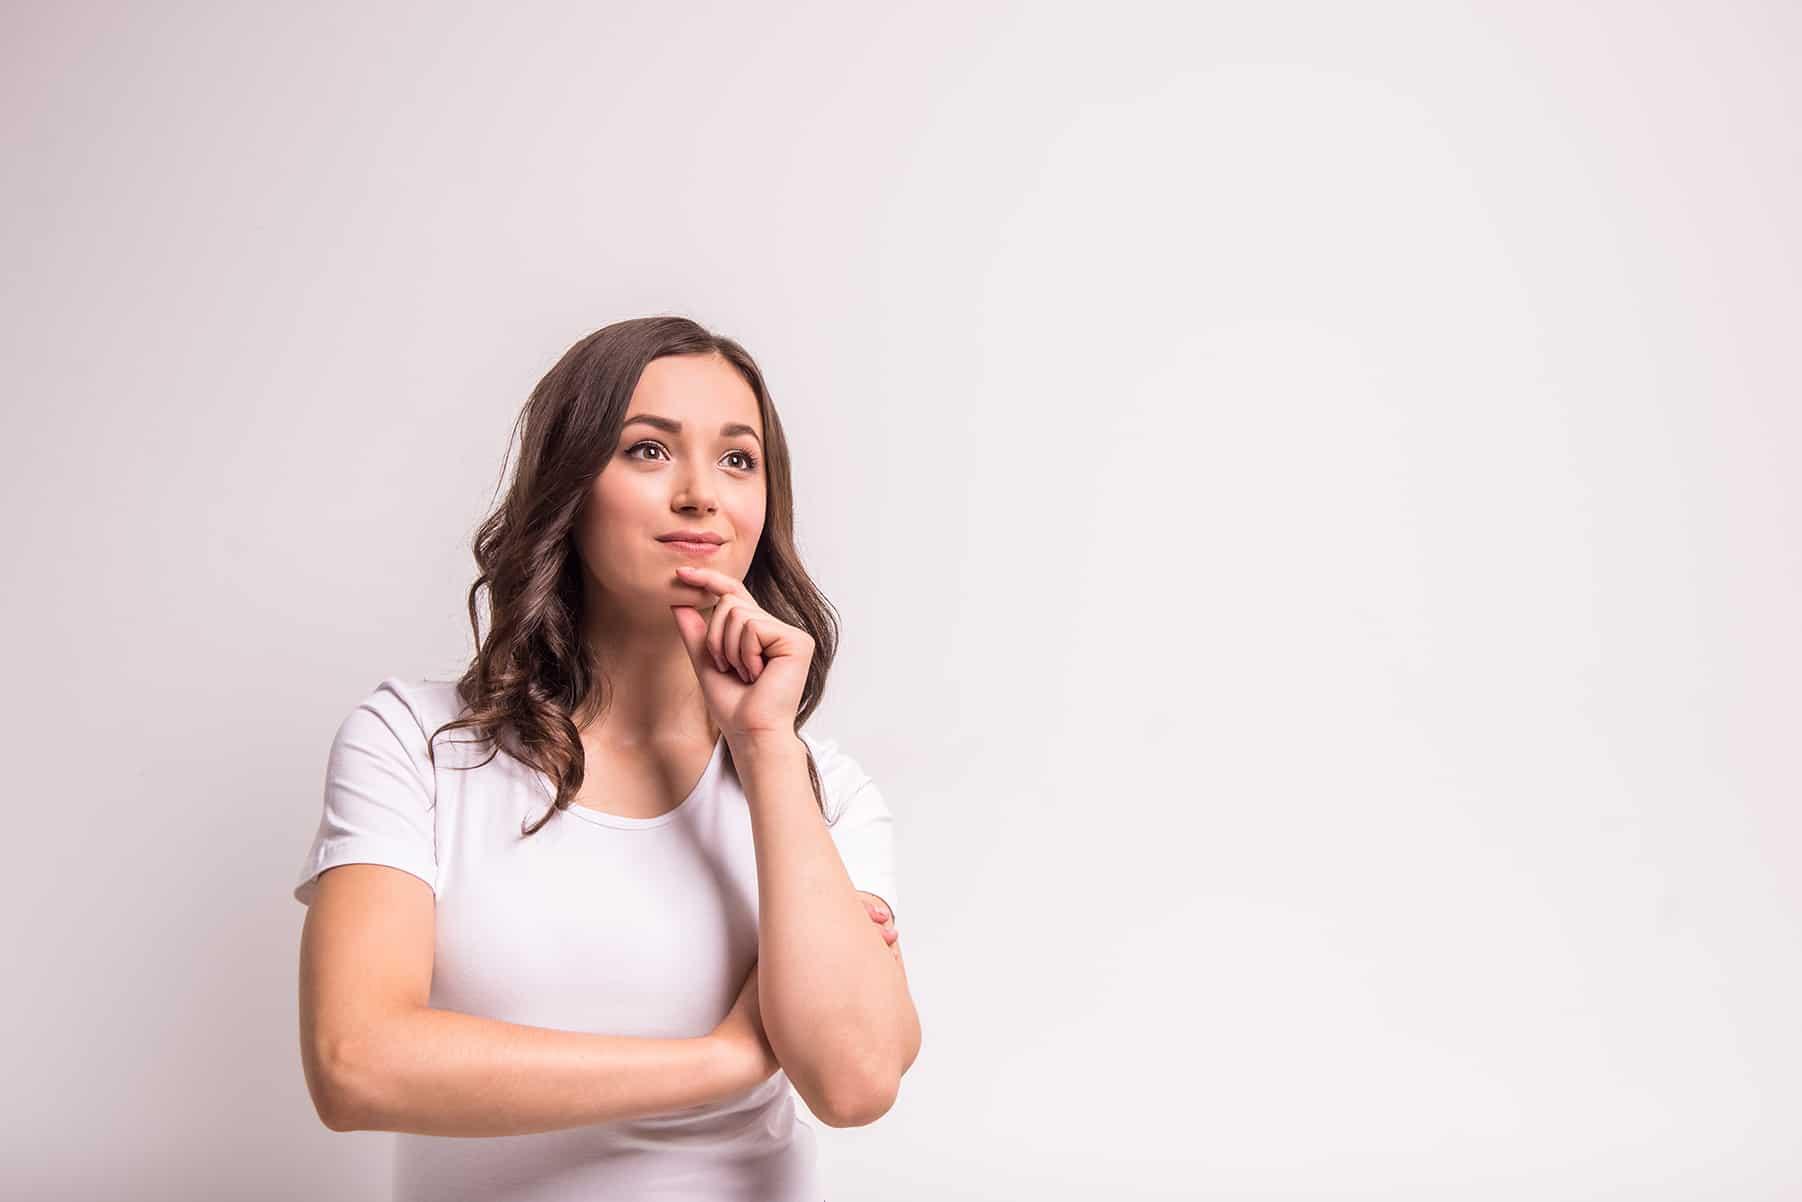 Woman ponders a career in holistic health coaching